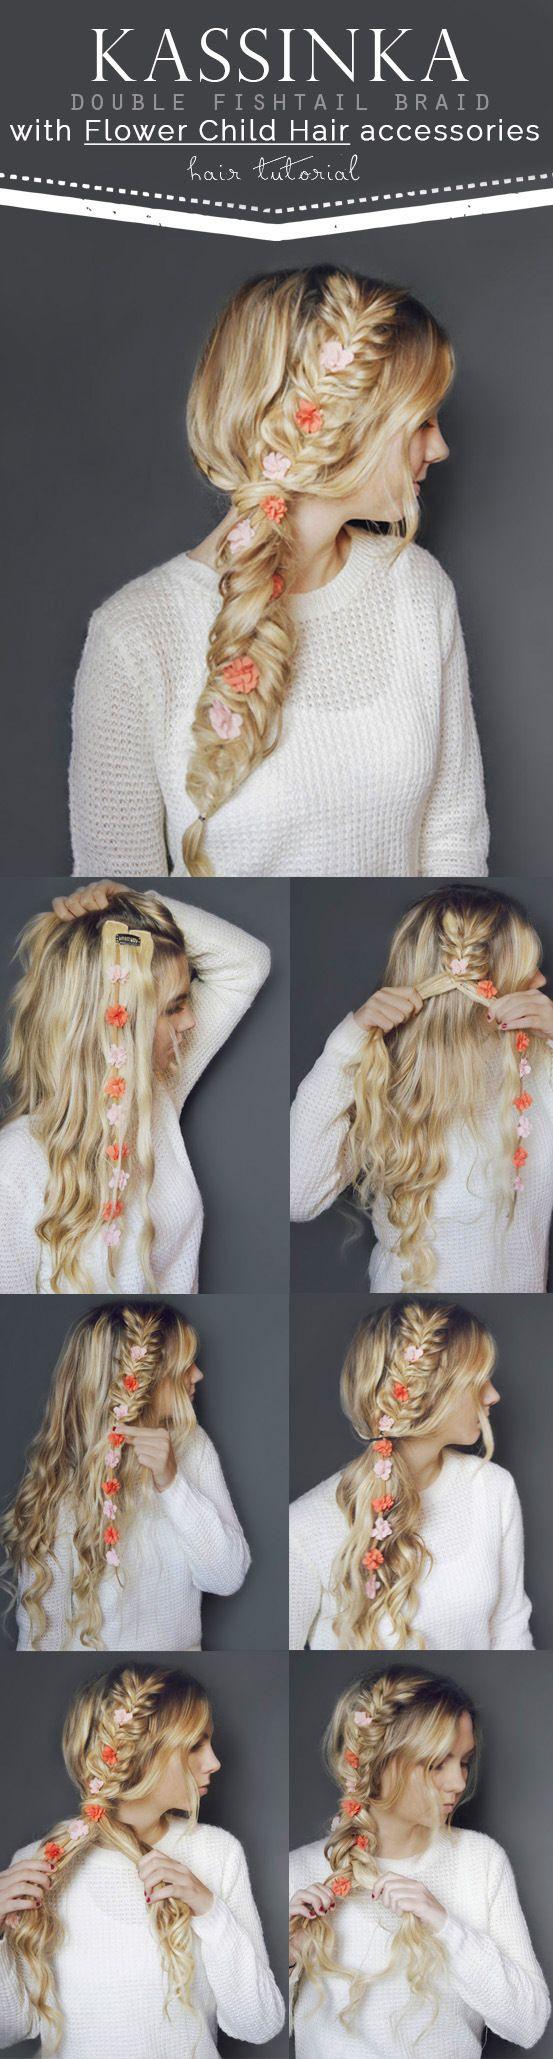 Kassinka hair tutorial with flower child hair accessories hair